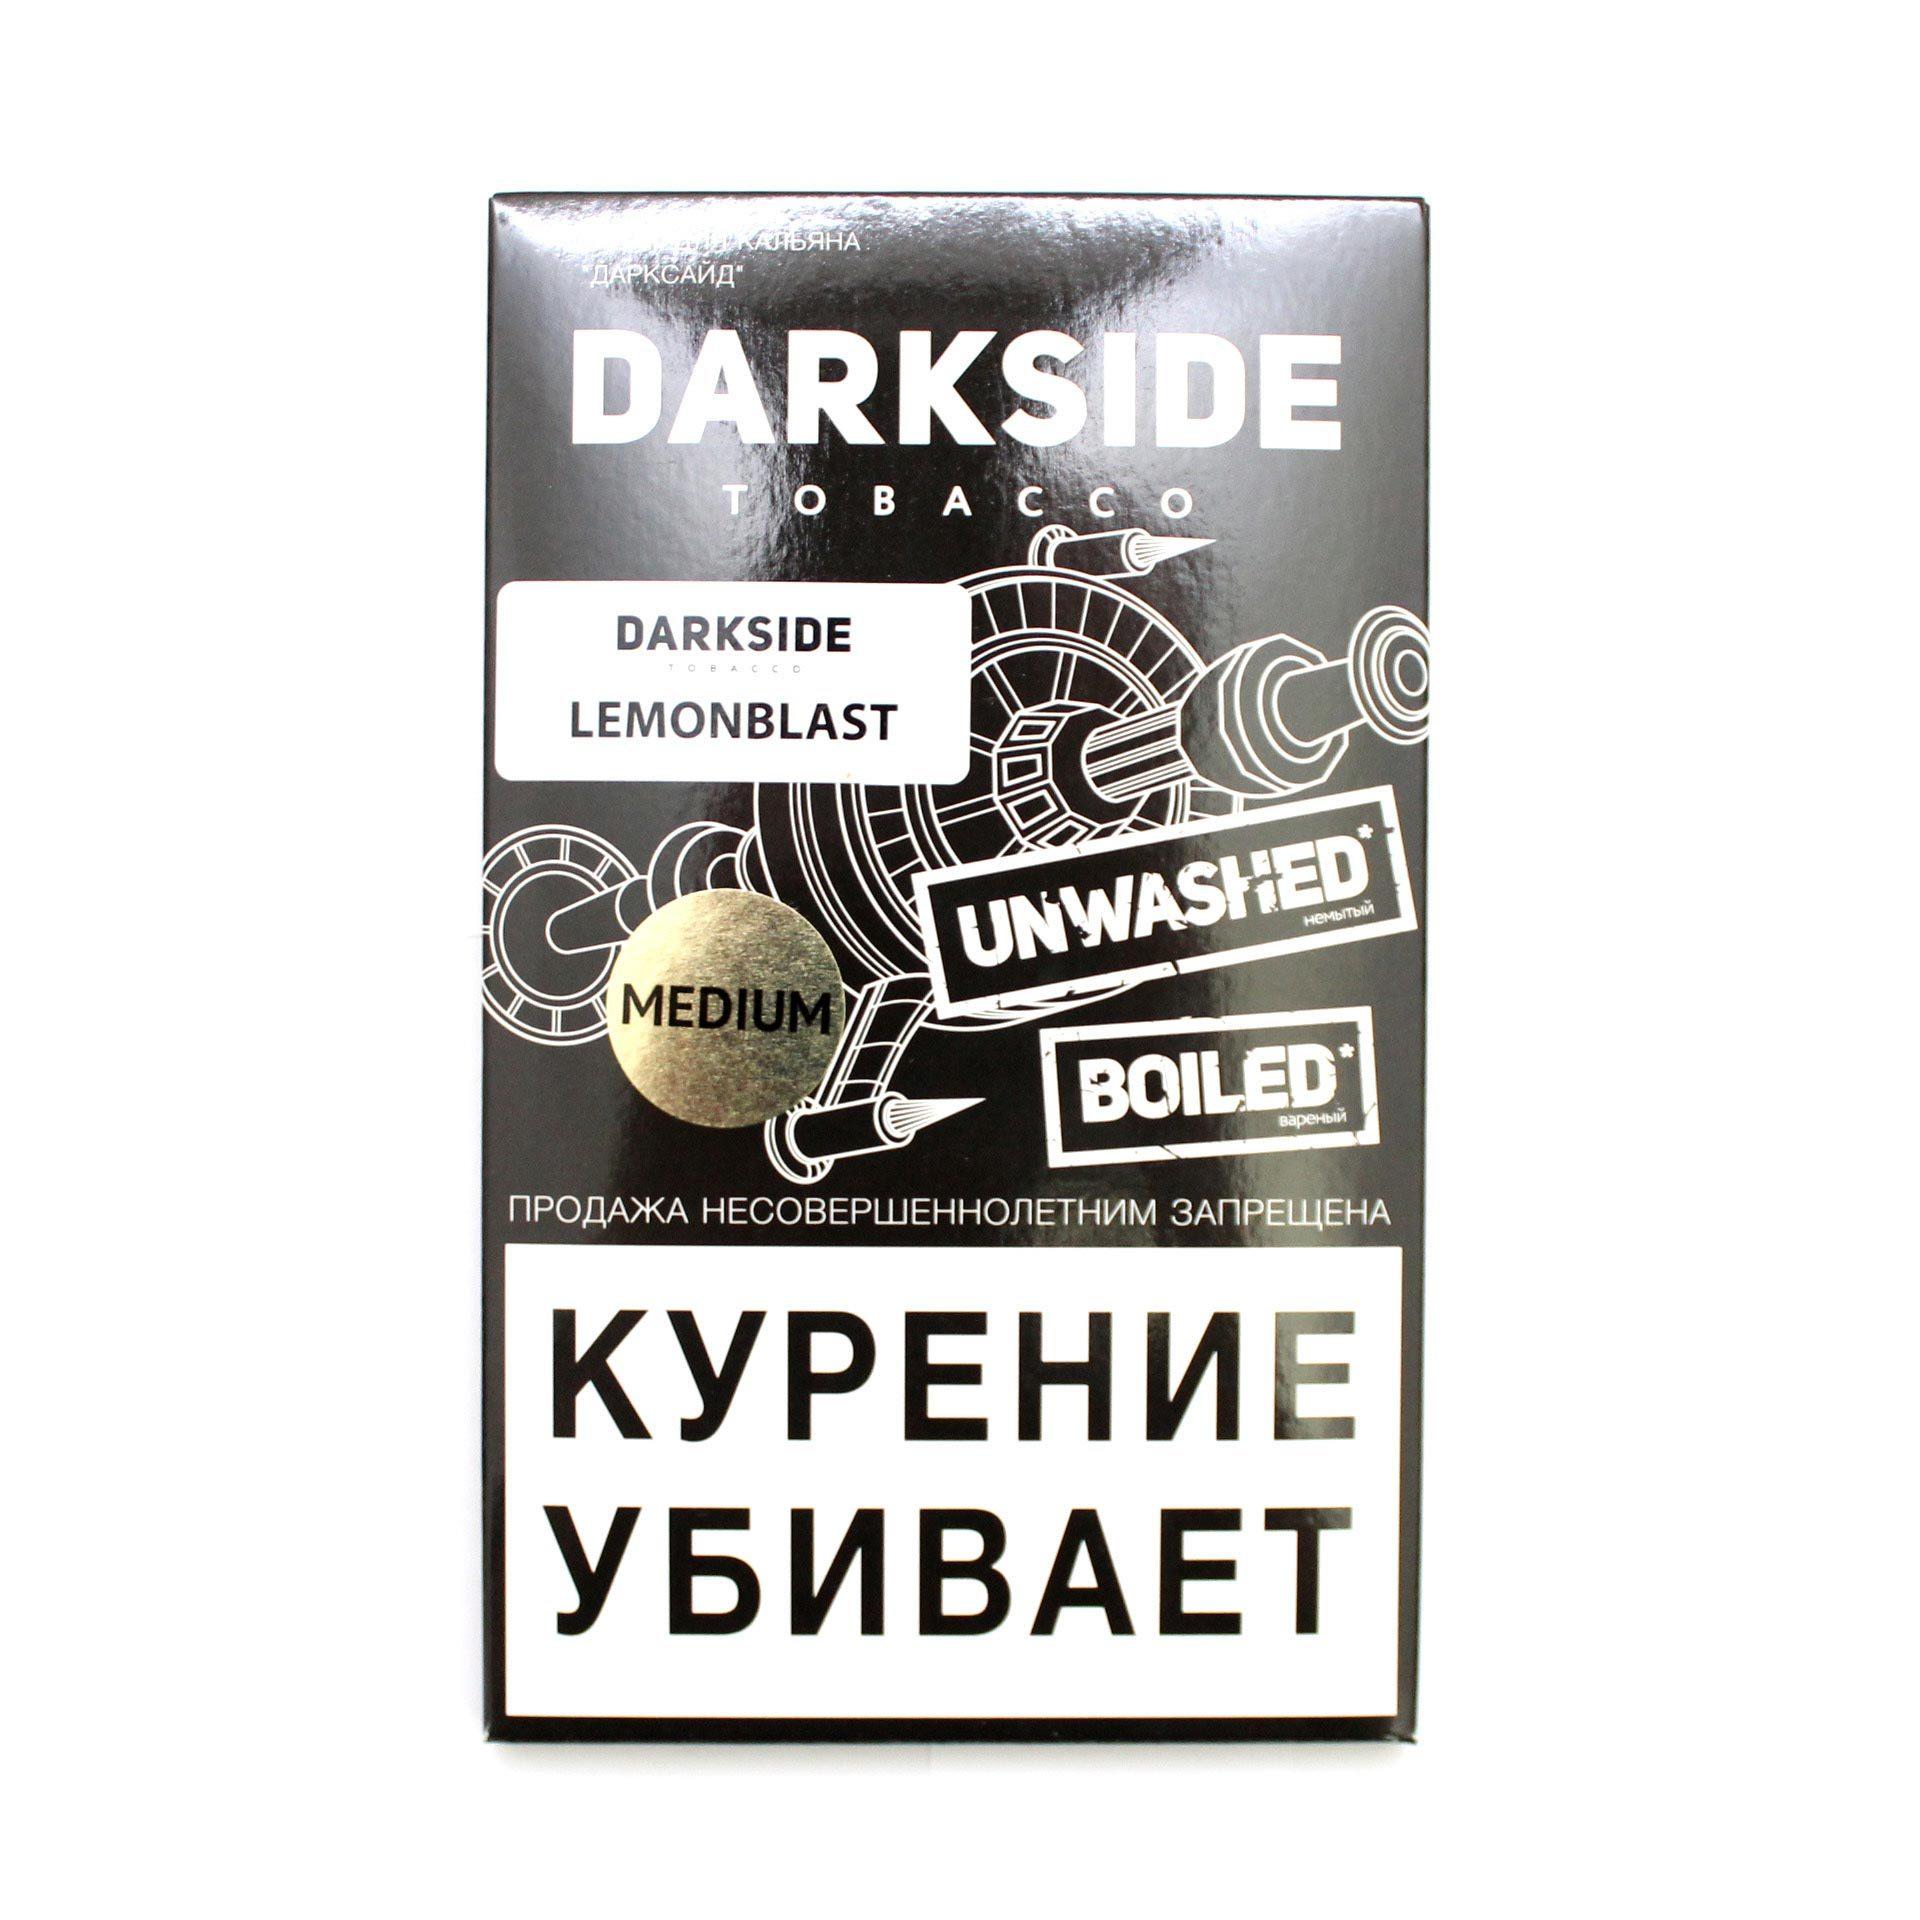 Табак для кальяна Dark Side Medium 100 гр. Lemonblast